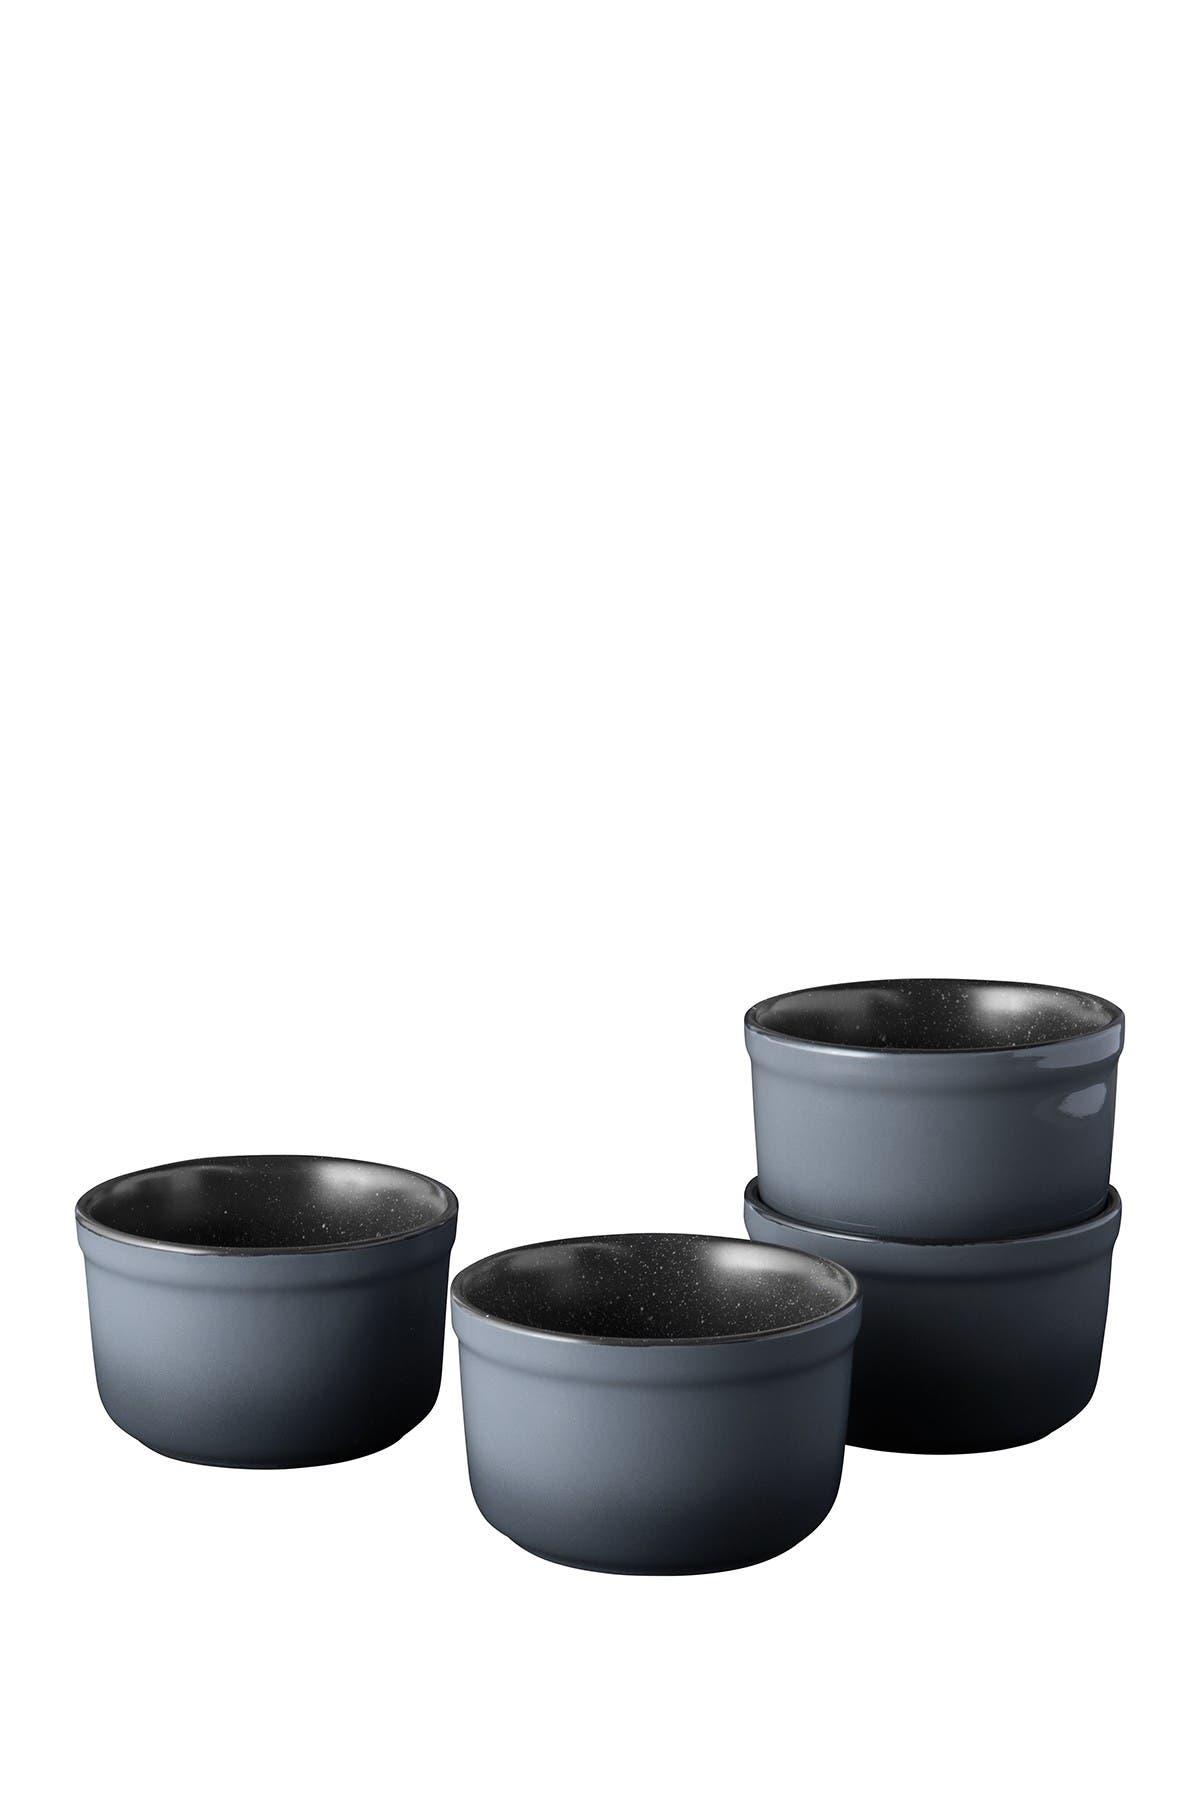 "Image of BergHOFF Grey Gem 4"" Stoneware Ramekin - Set of 4"